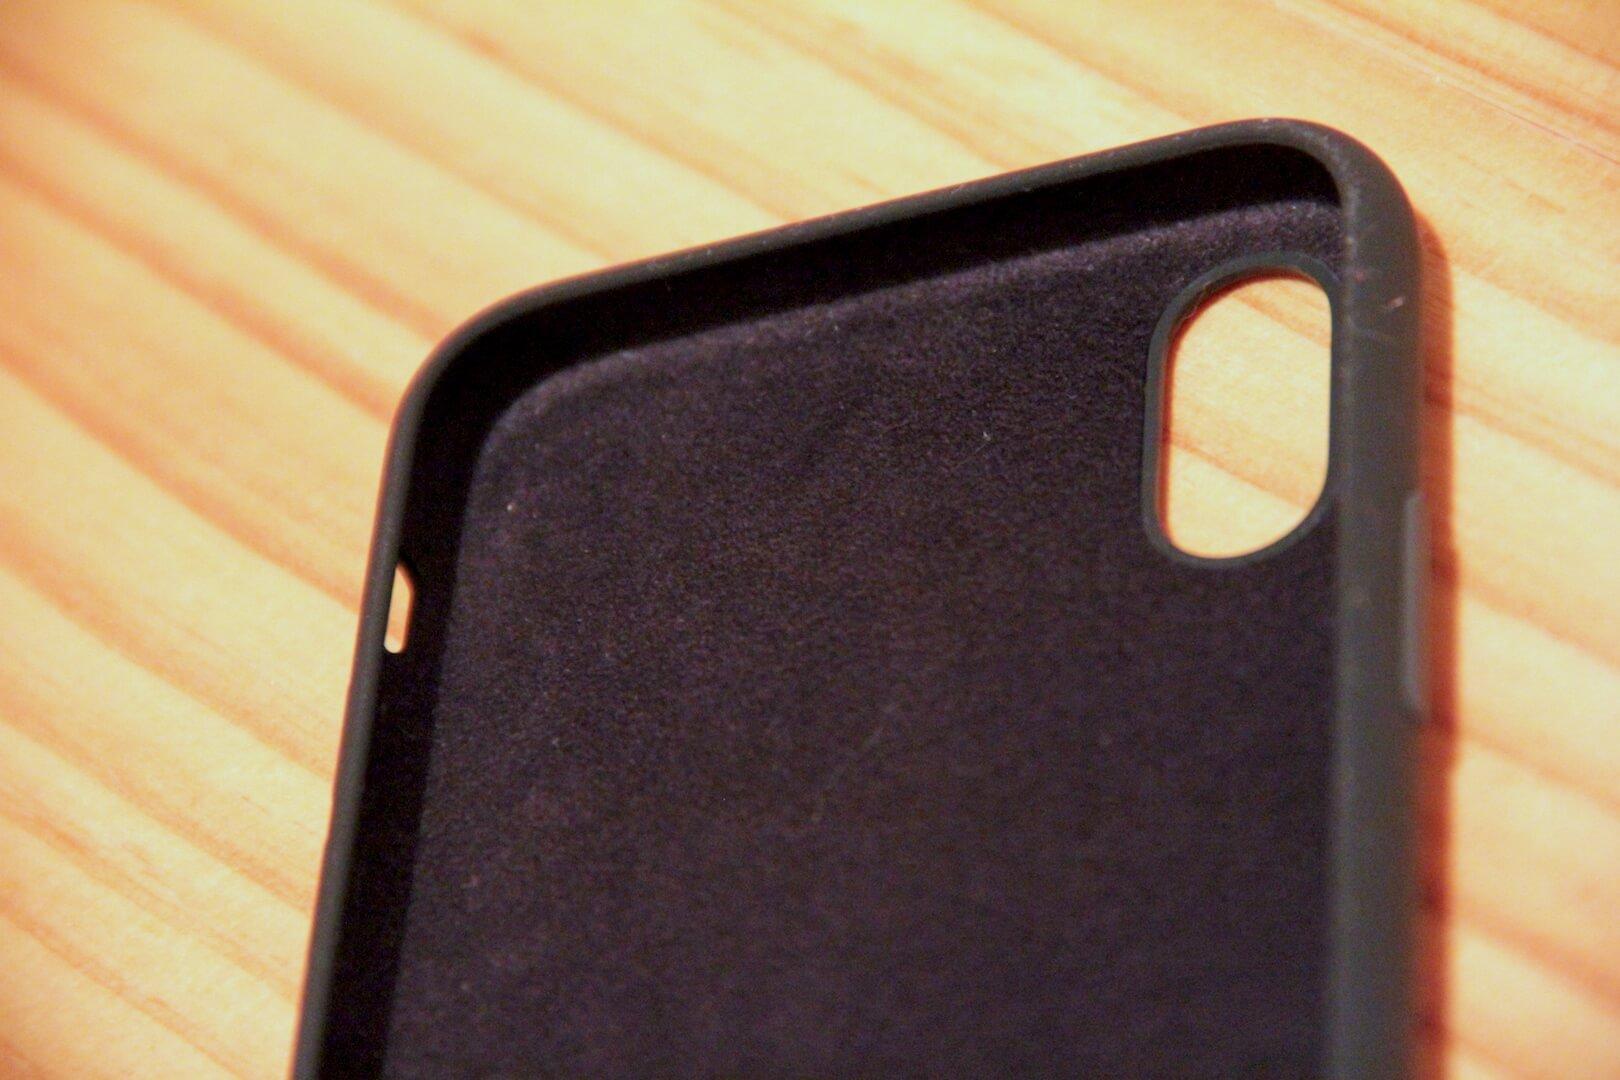 iPhoneXのApple純正ケースマイクロファイバーの写真